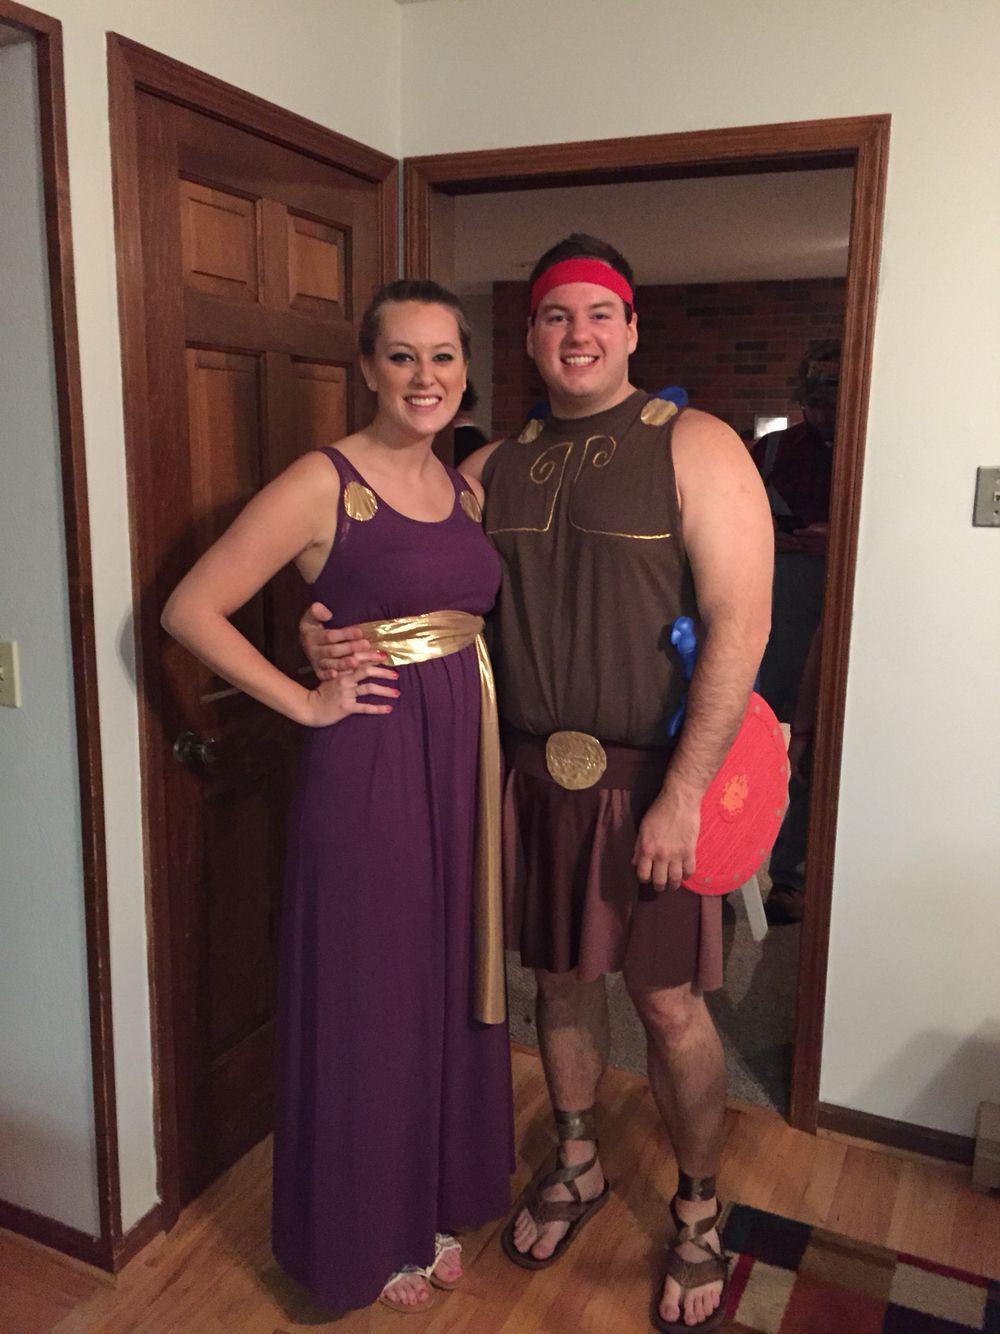 Hercules and Meg DIY costume | DIY crafts | Pinterest ...